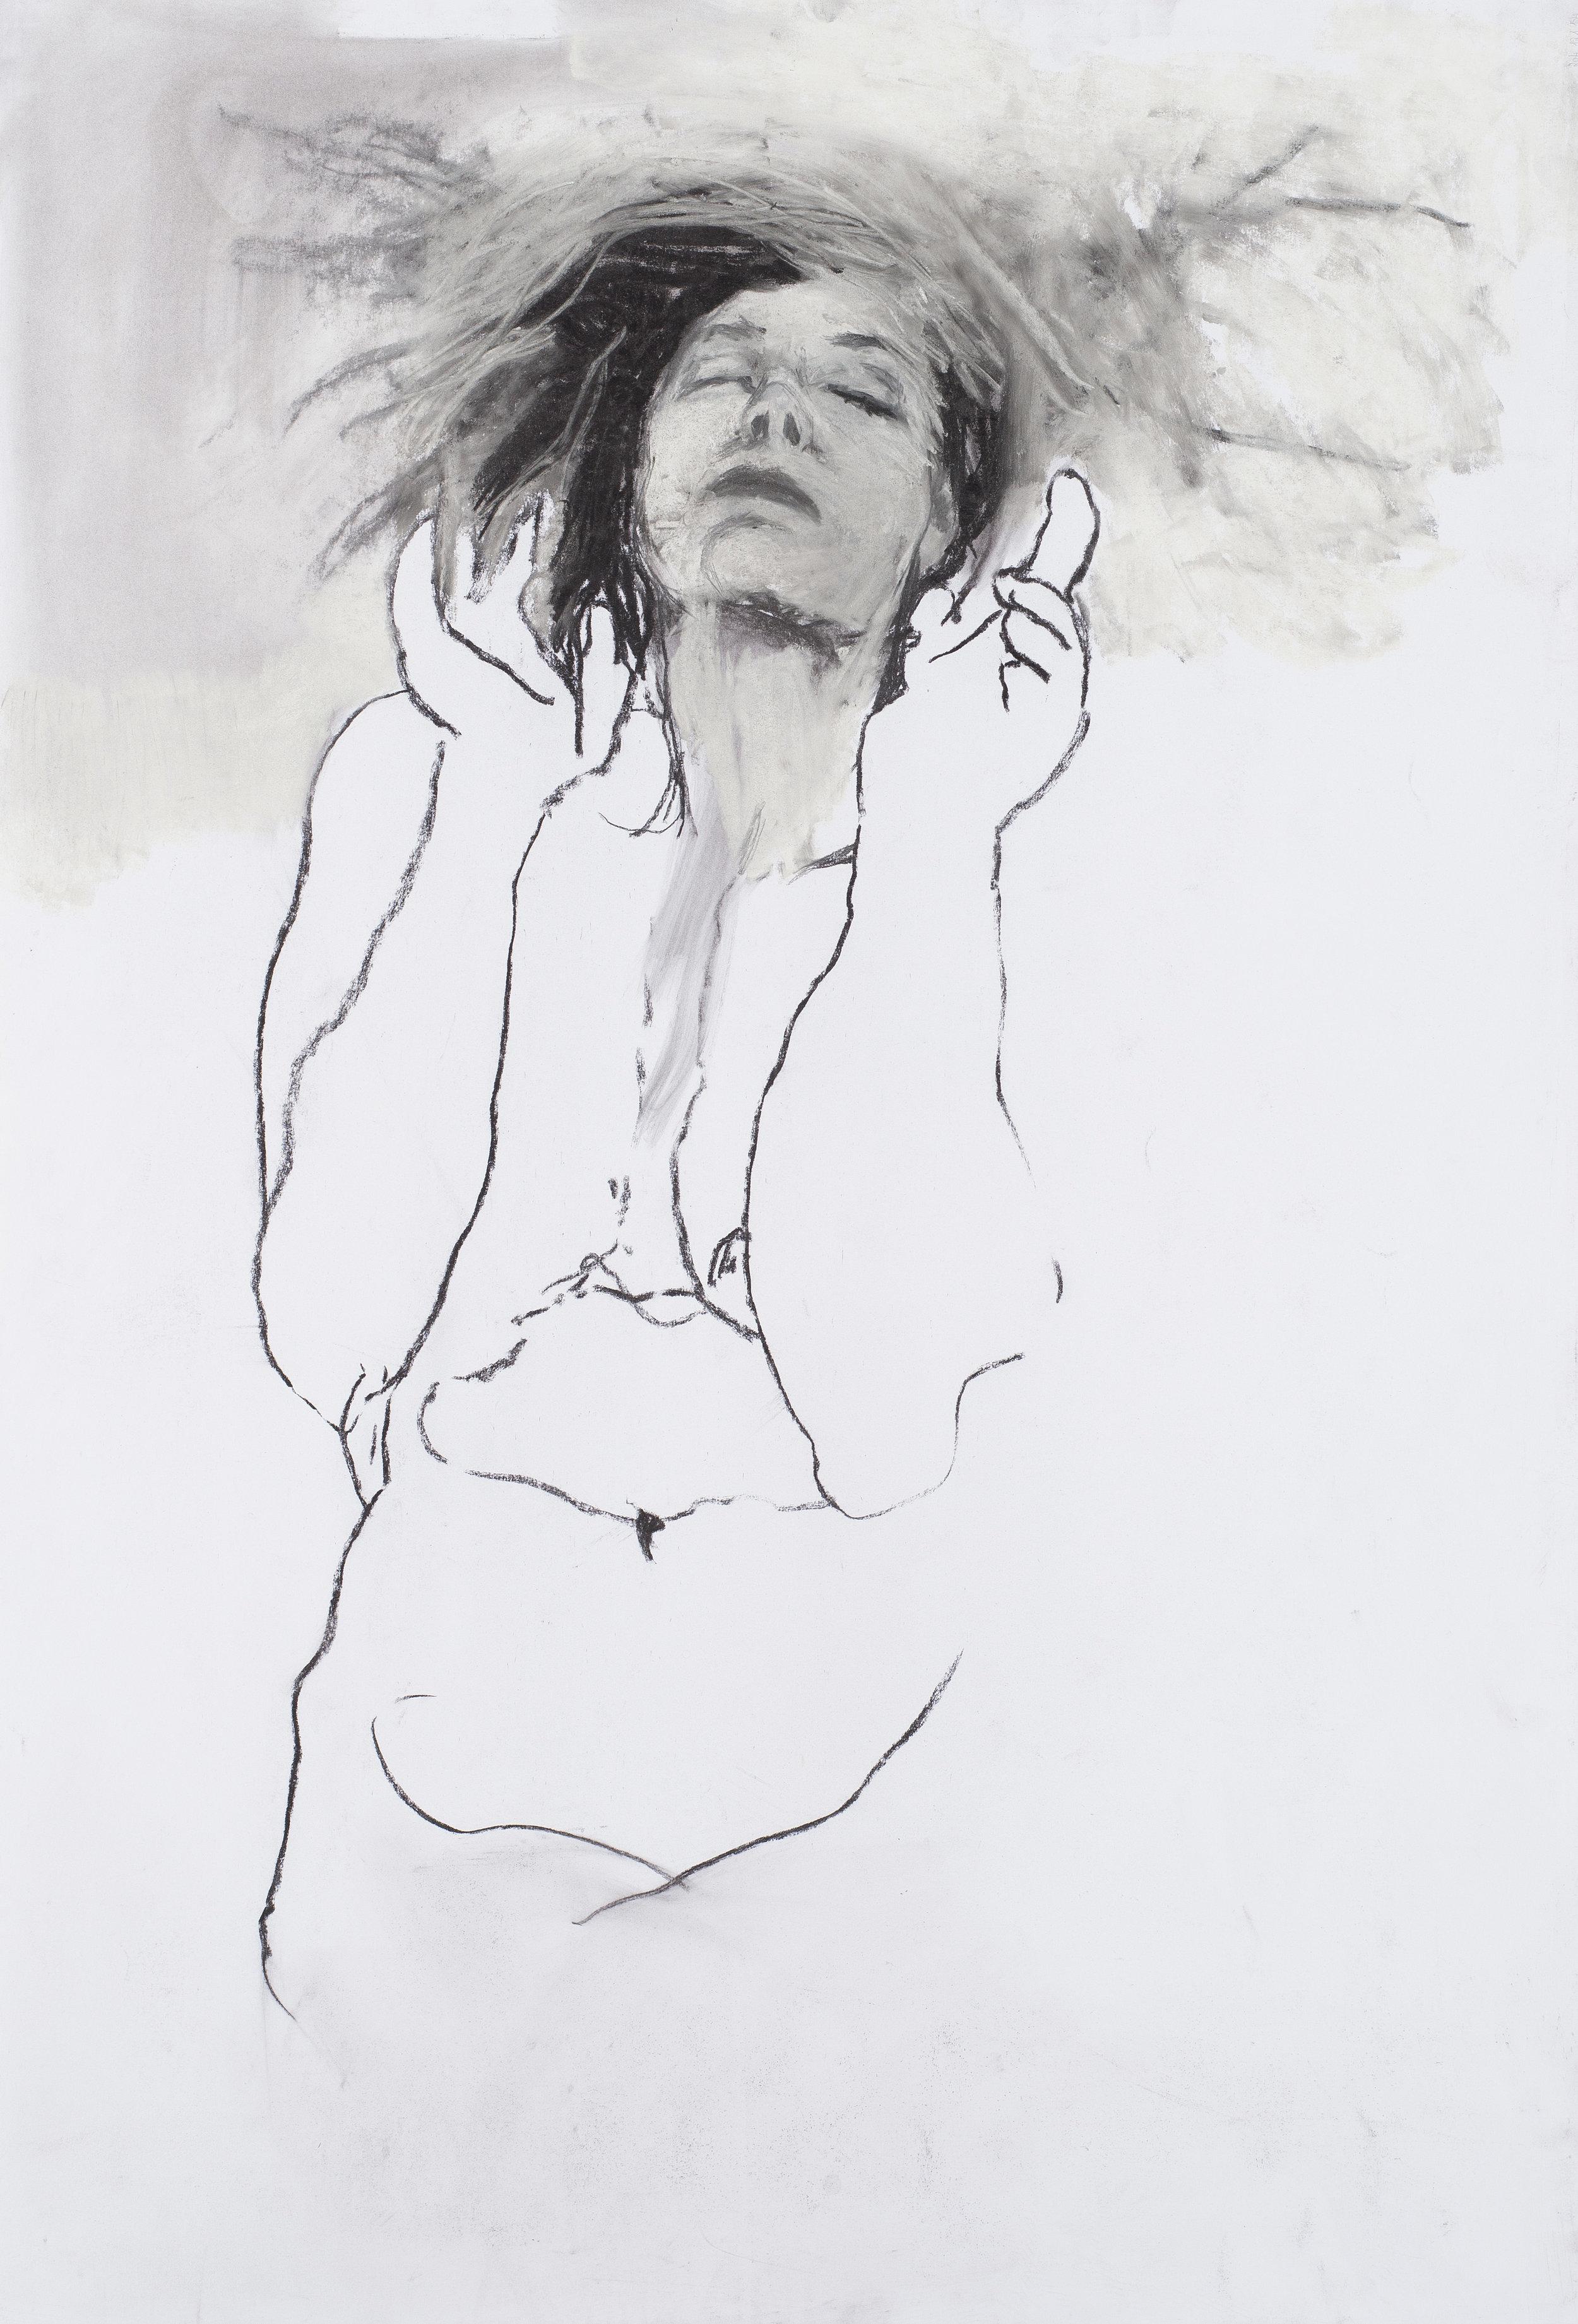 Eros couronné de roses 3 - 201675 x 110 cm